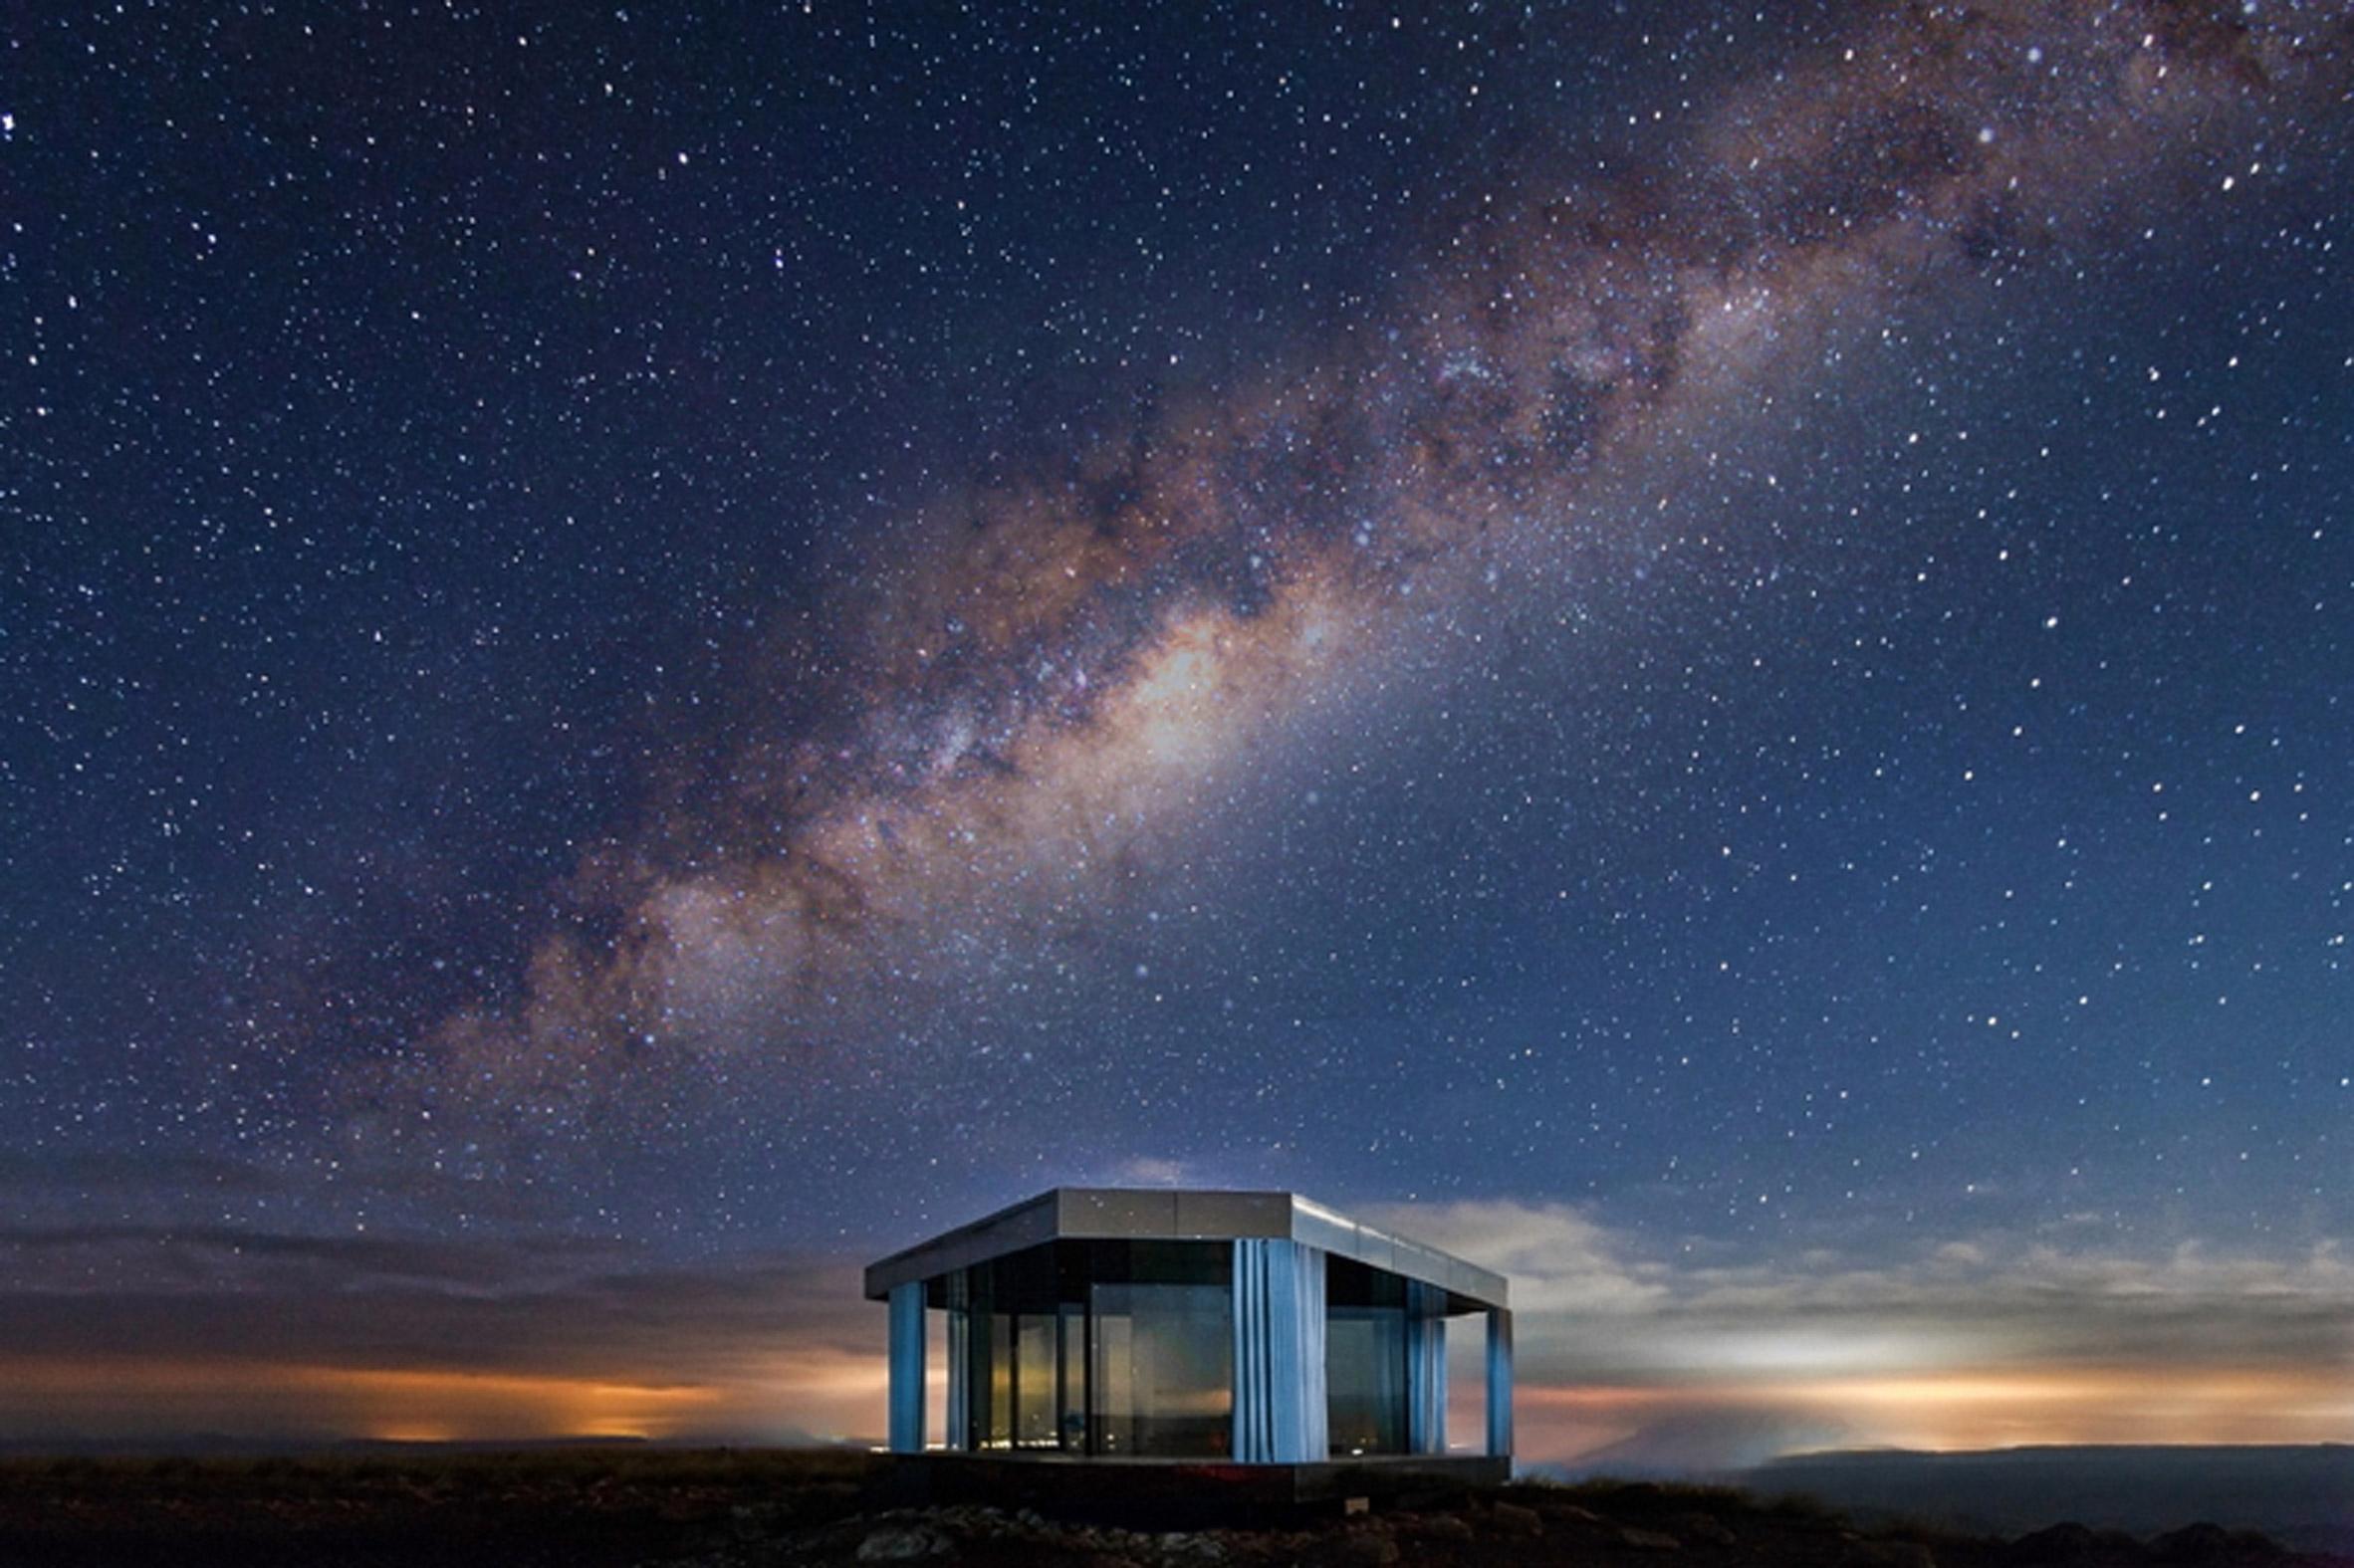 Glass Pavilion by OFIS Arhitekti provides a platform for star gazing in a Spanish desert